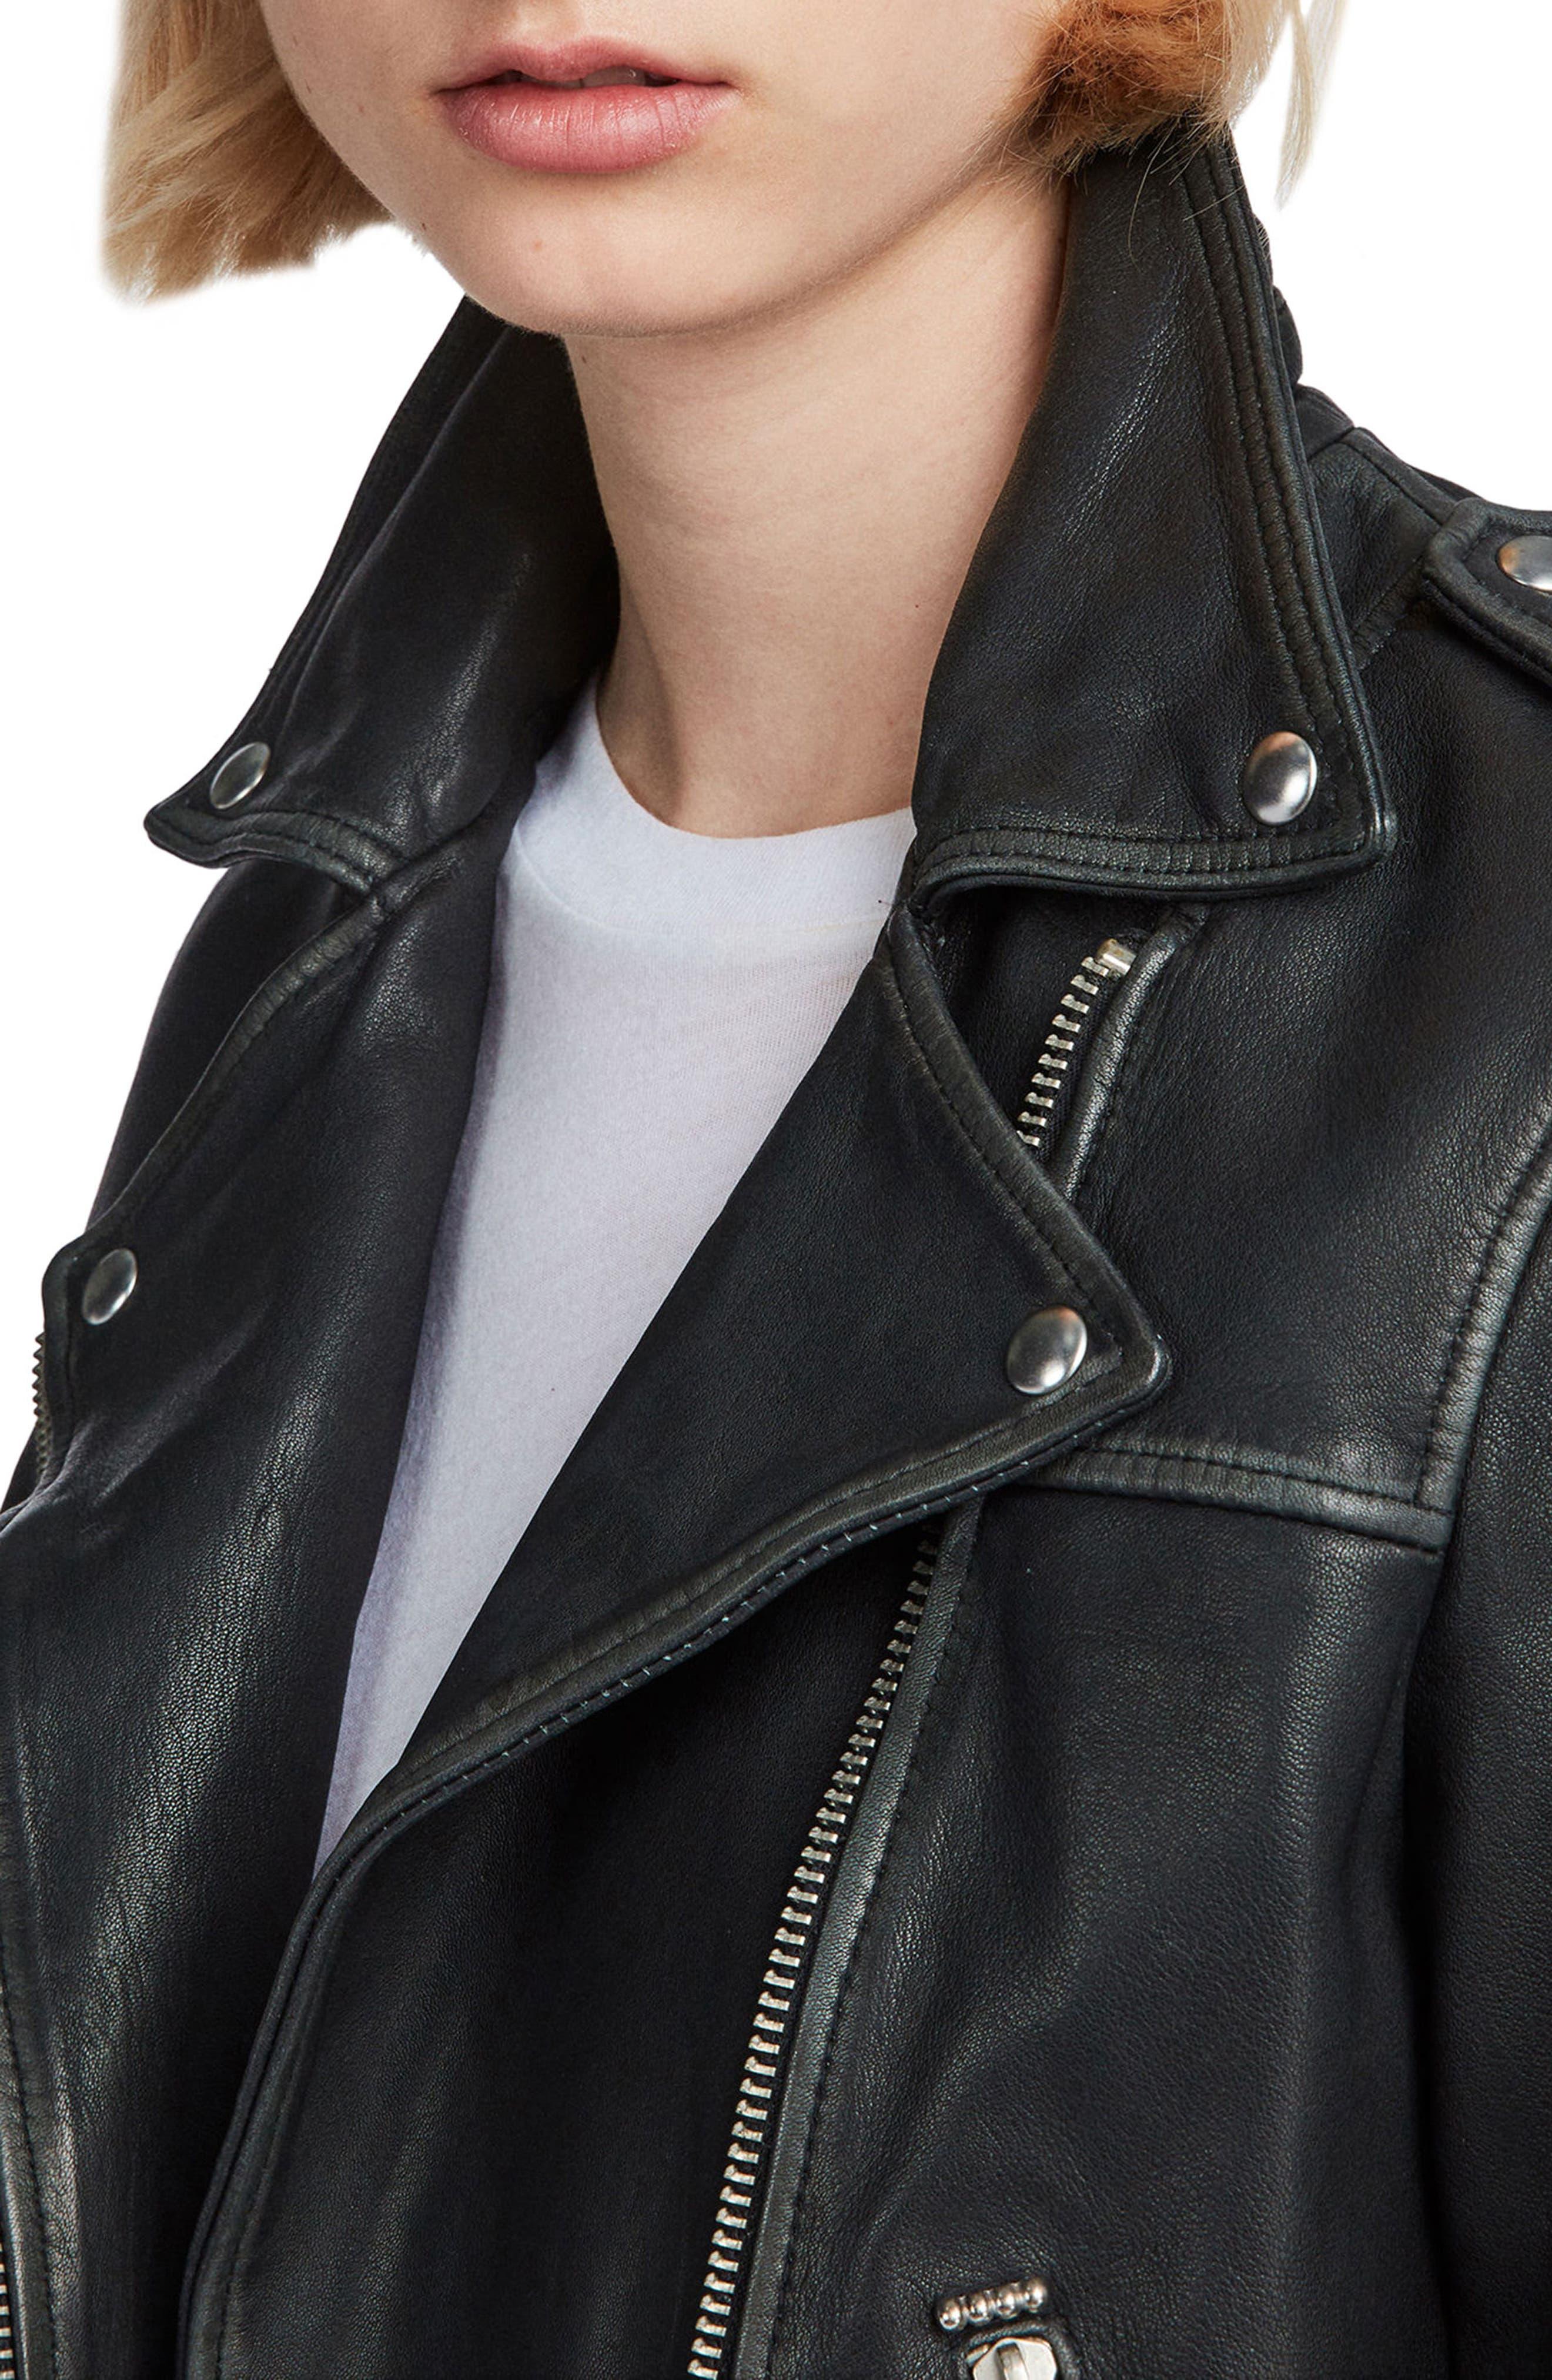 Lara Sheepskin Leather Biker Jacket,                             Alternate thumbnail 5, color,                             001